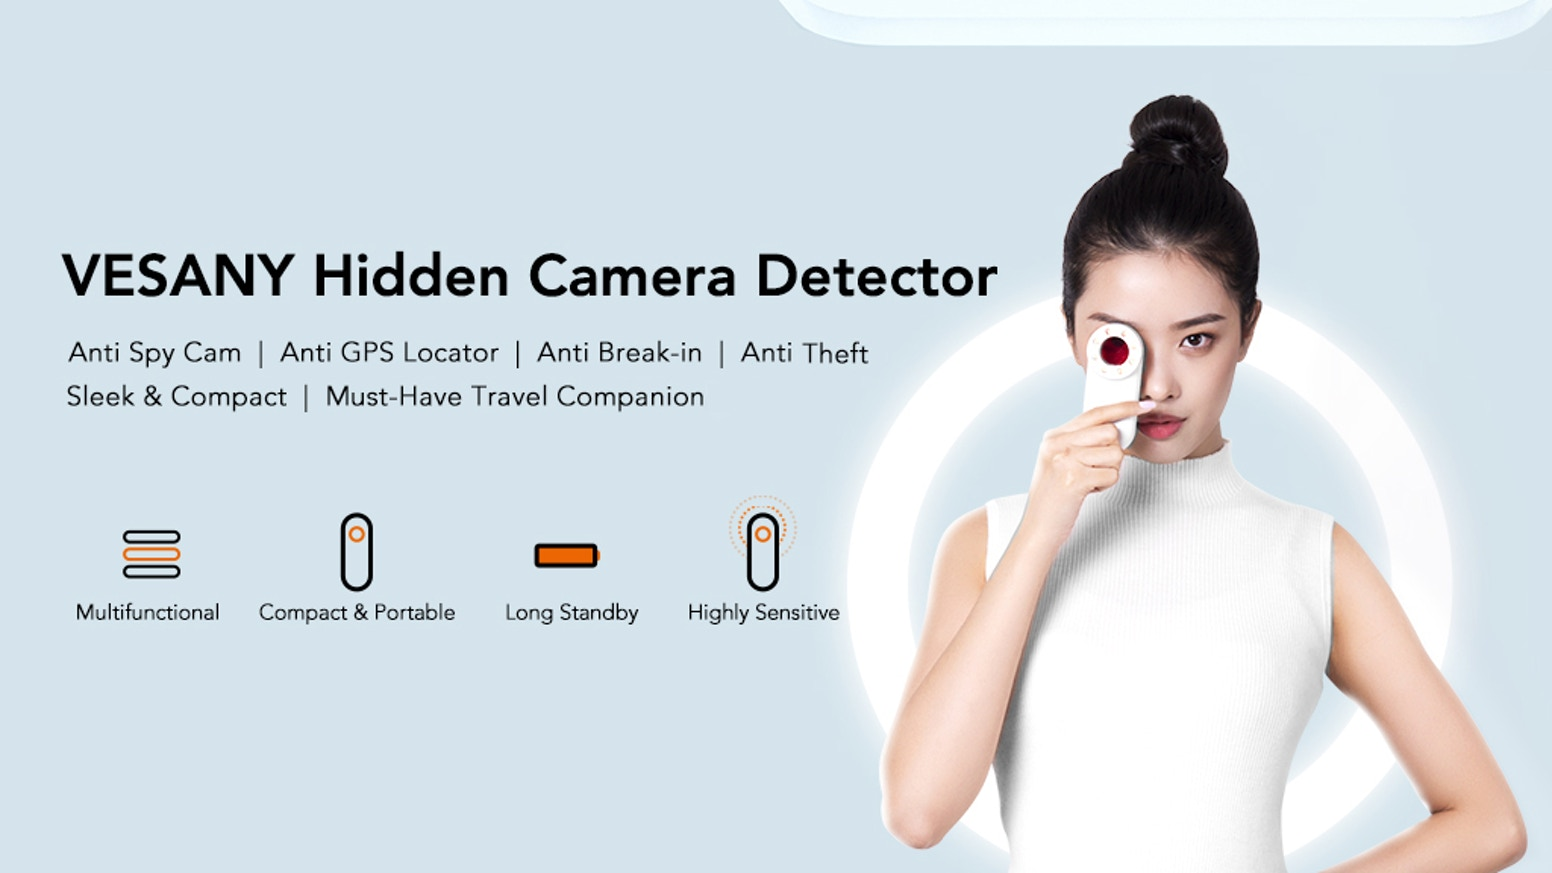 Anti Spy Cam | Anti GPS Locator | Anti Break-in | Anti Theft | Sleek & Compact | Must-Have Travel Companion